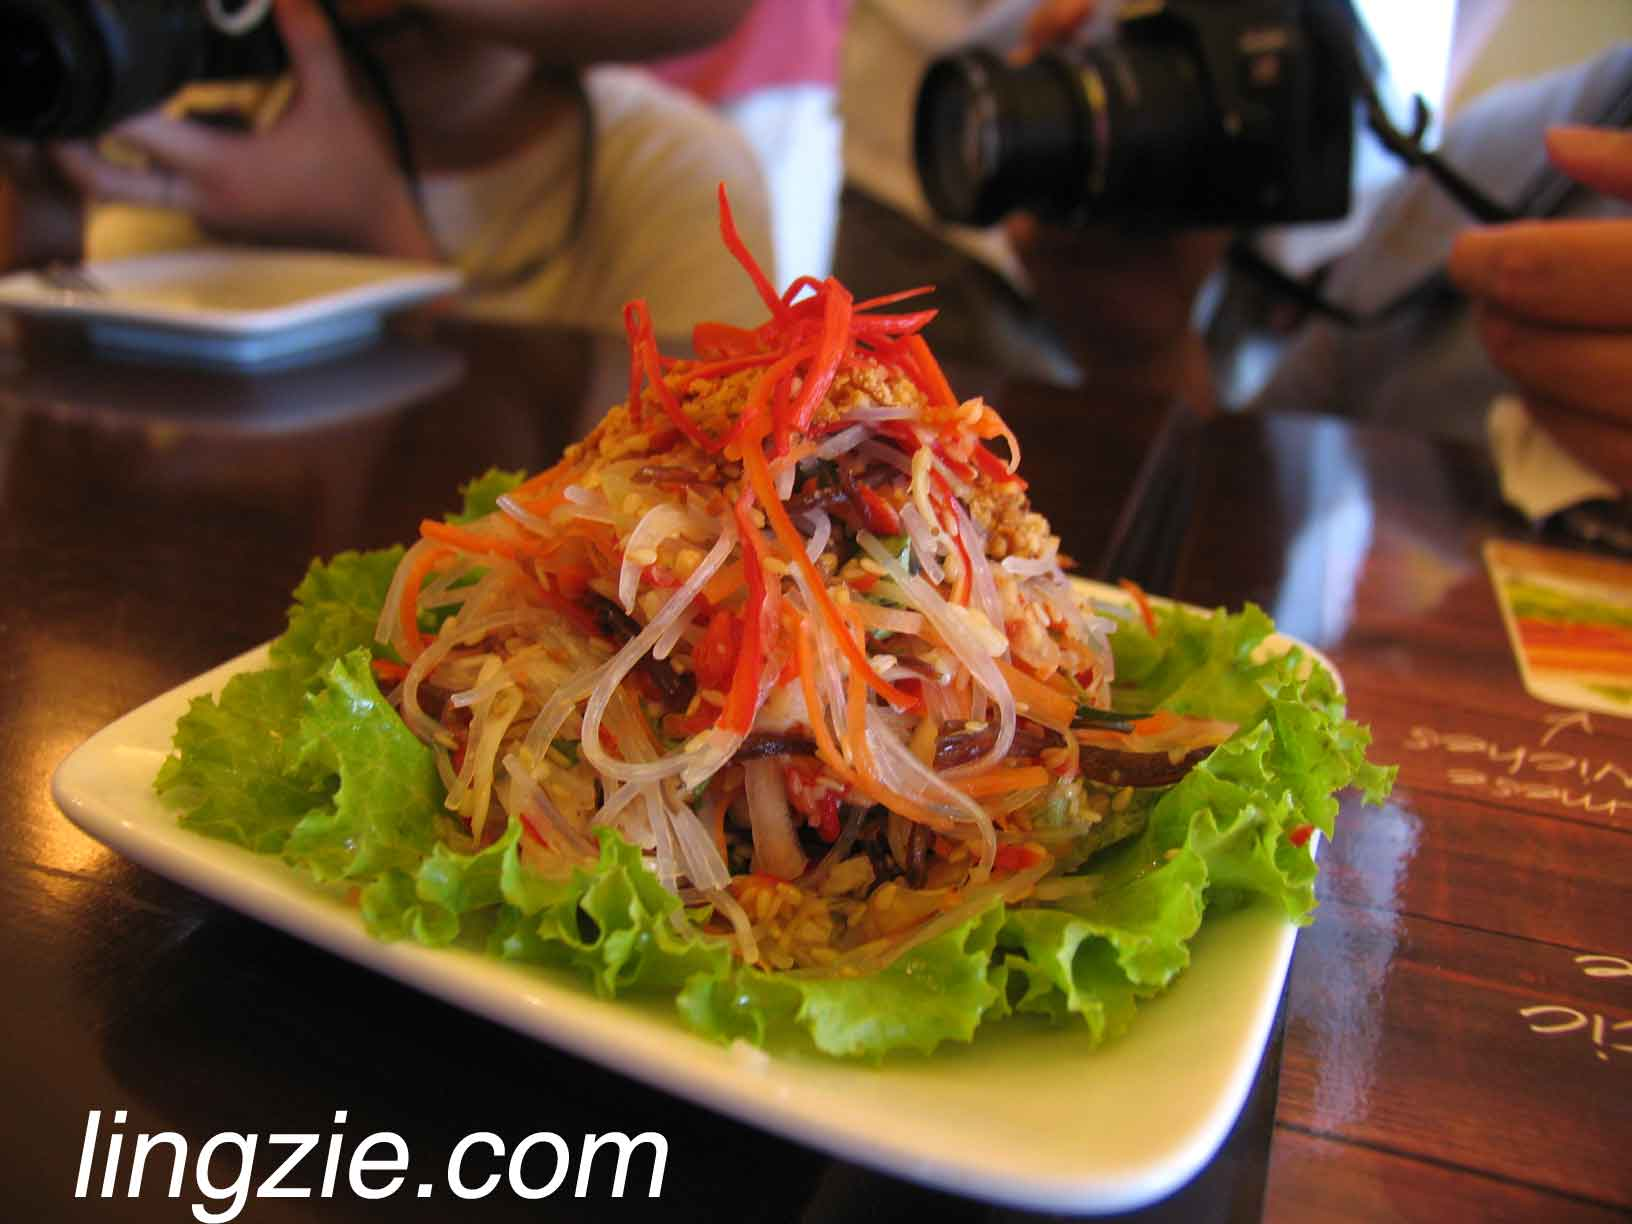 Sour Green Mango Salad (RM7.80)